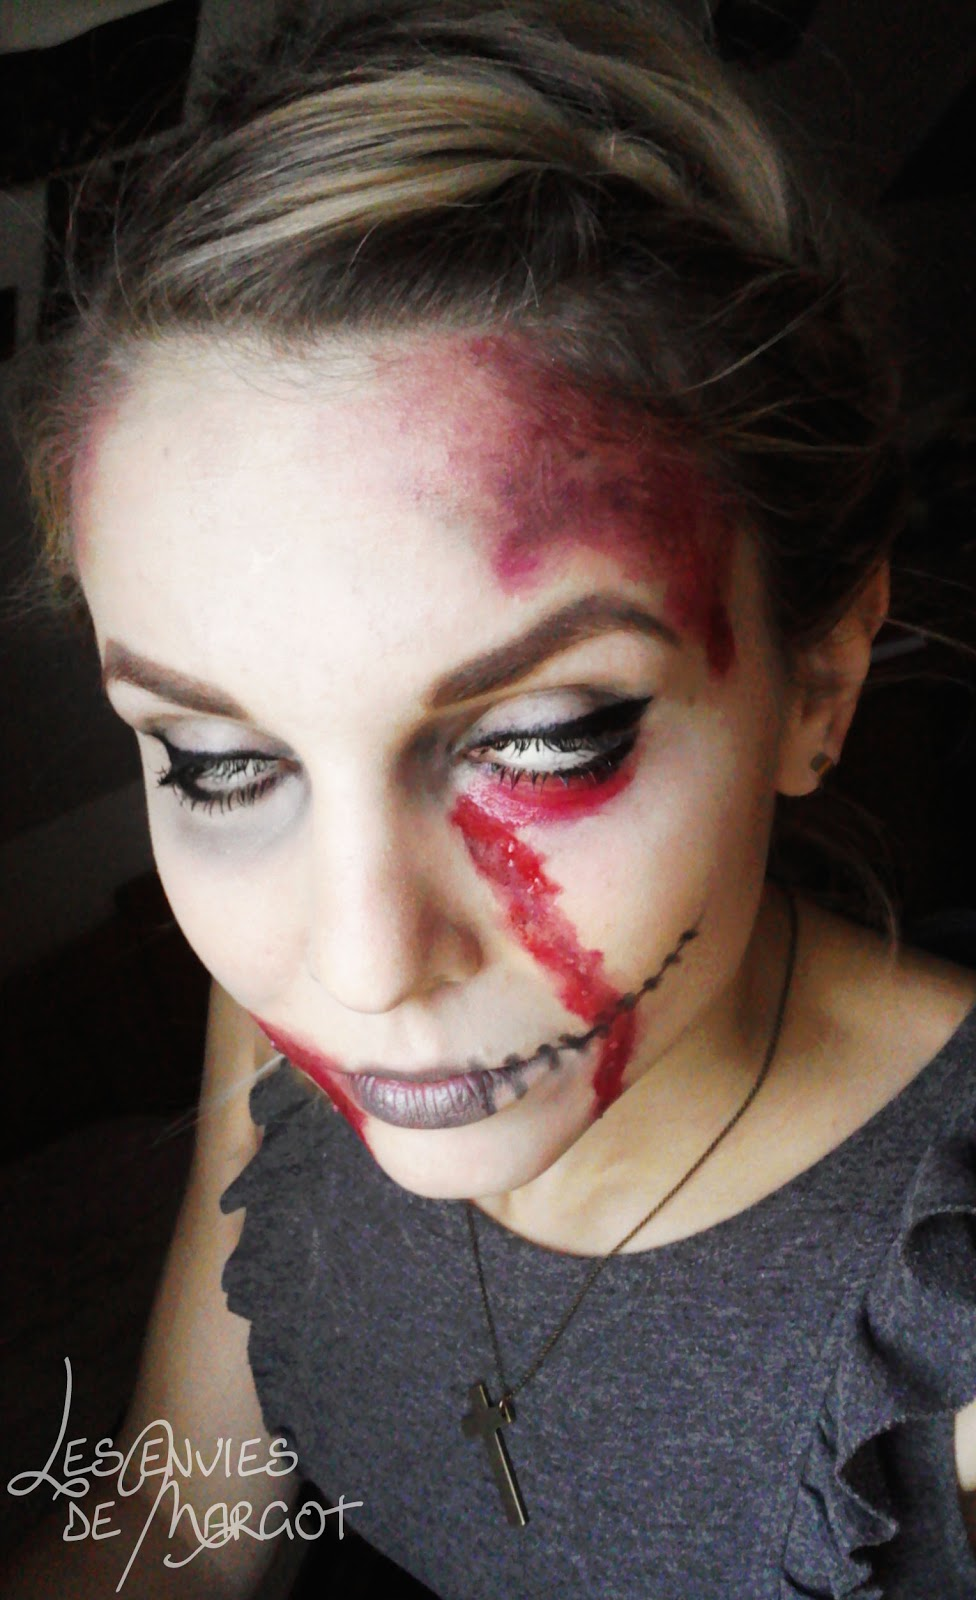 Qui fait peur maquillage images - Maquillage halloween qui fait peur ...